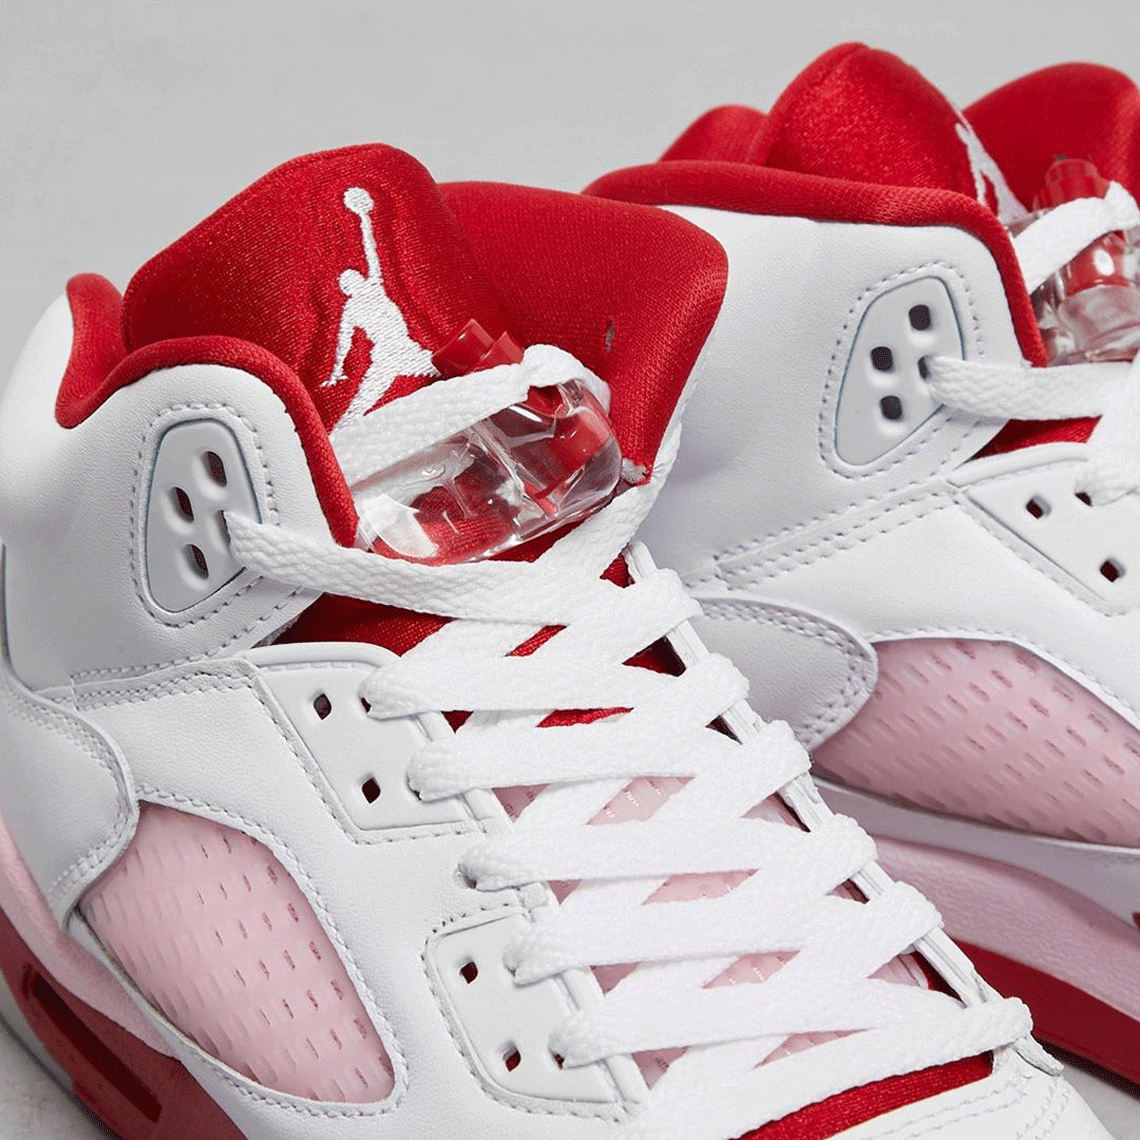 Air Jordan 5 Kids White Pink Foam 440892-106 | SneakerNews.com